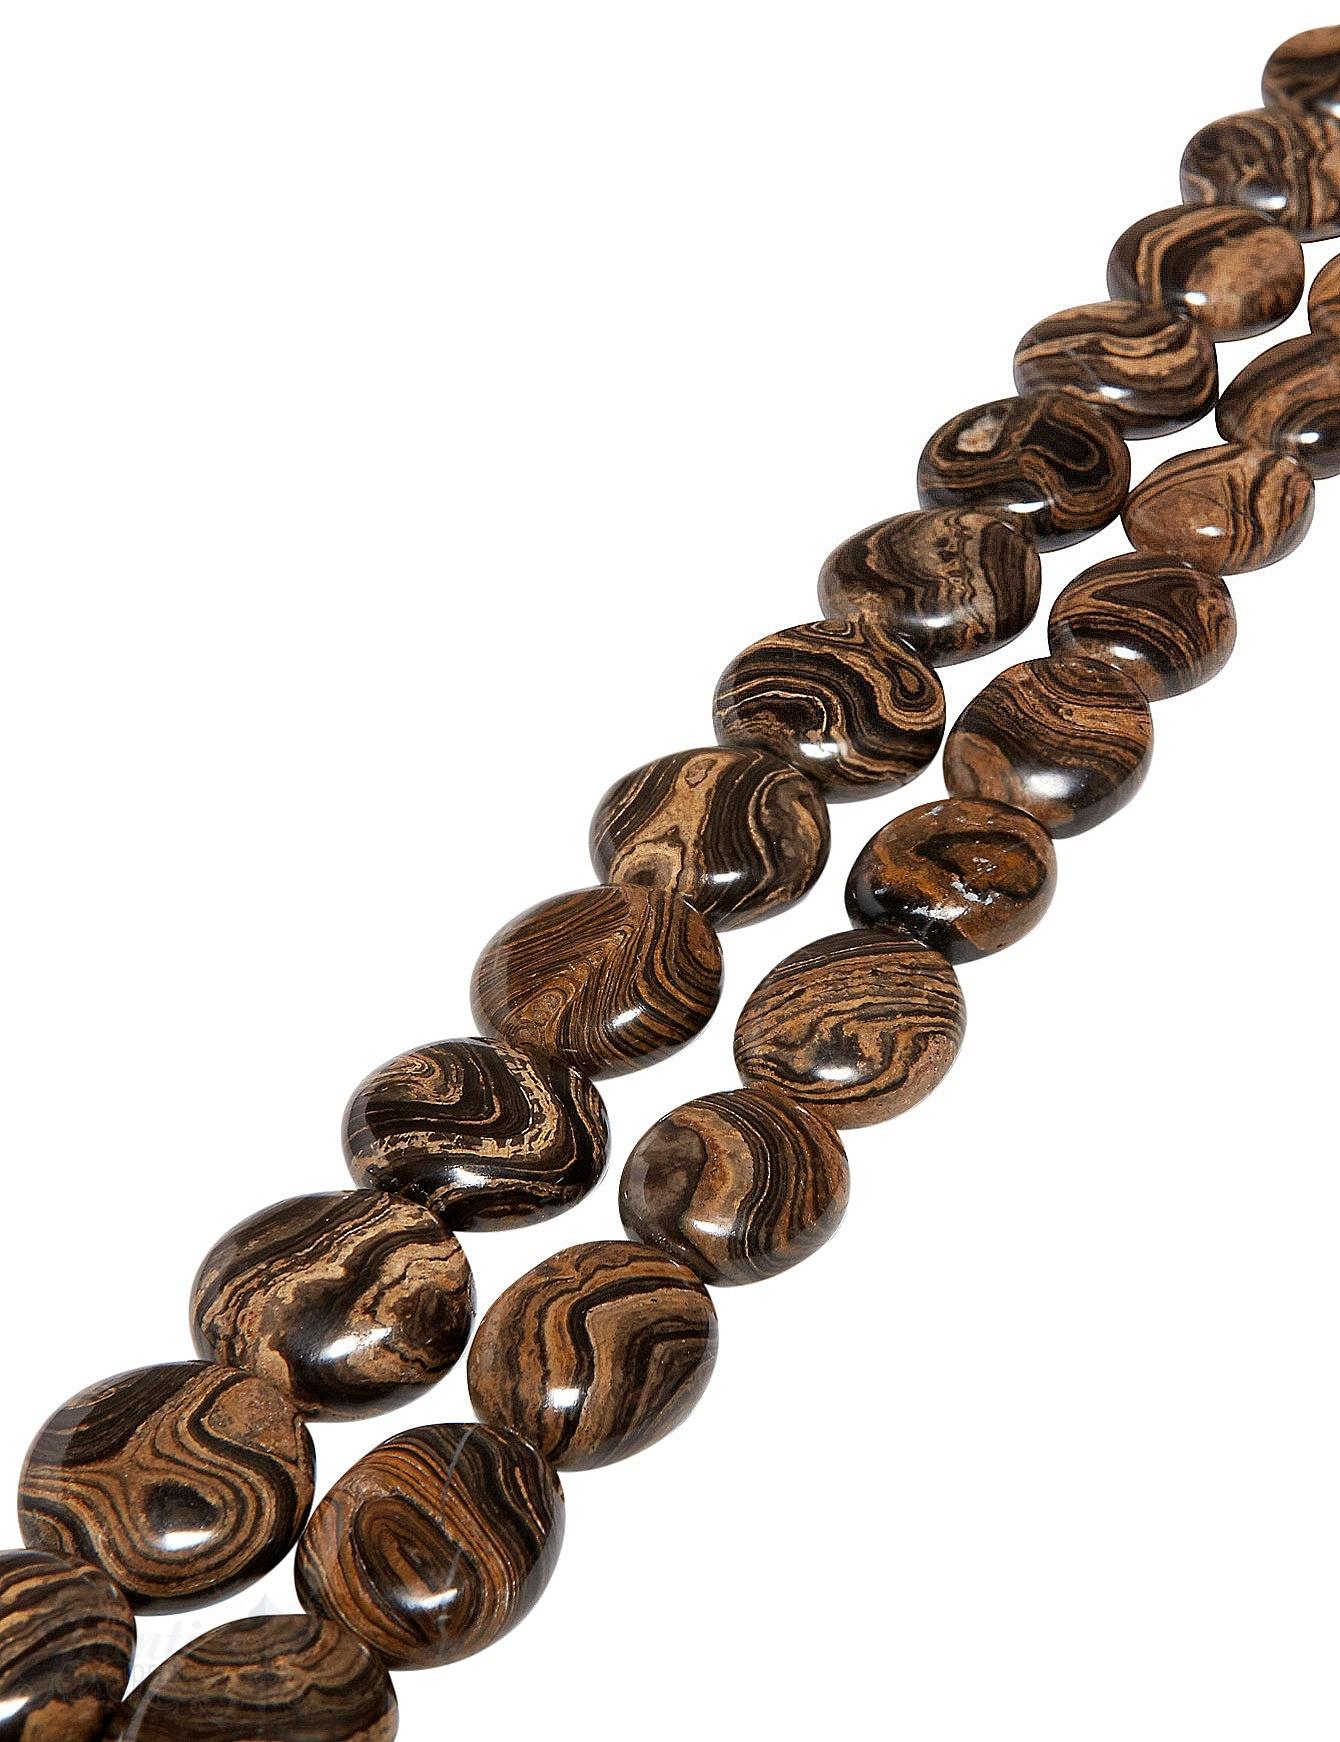 Schlangen-Jaspis Strang braun-beige poliert Disk AAA gefleckt